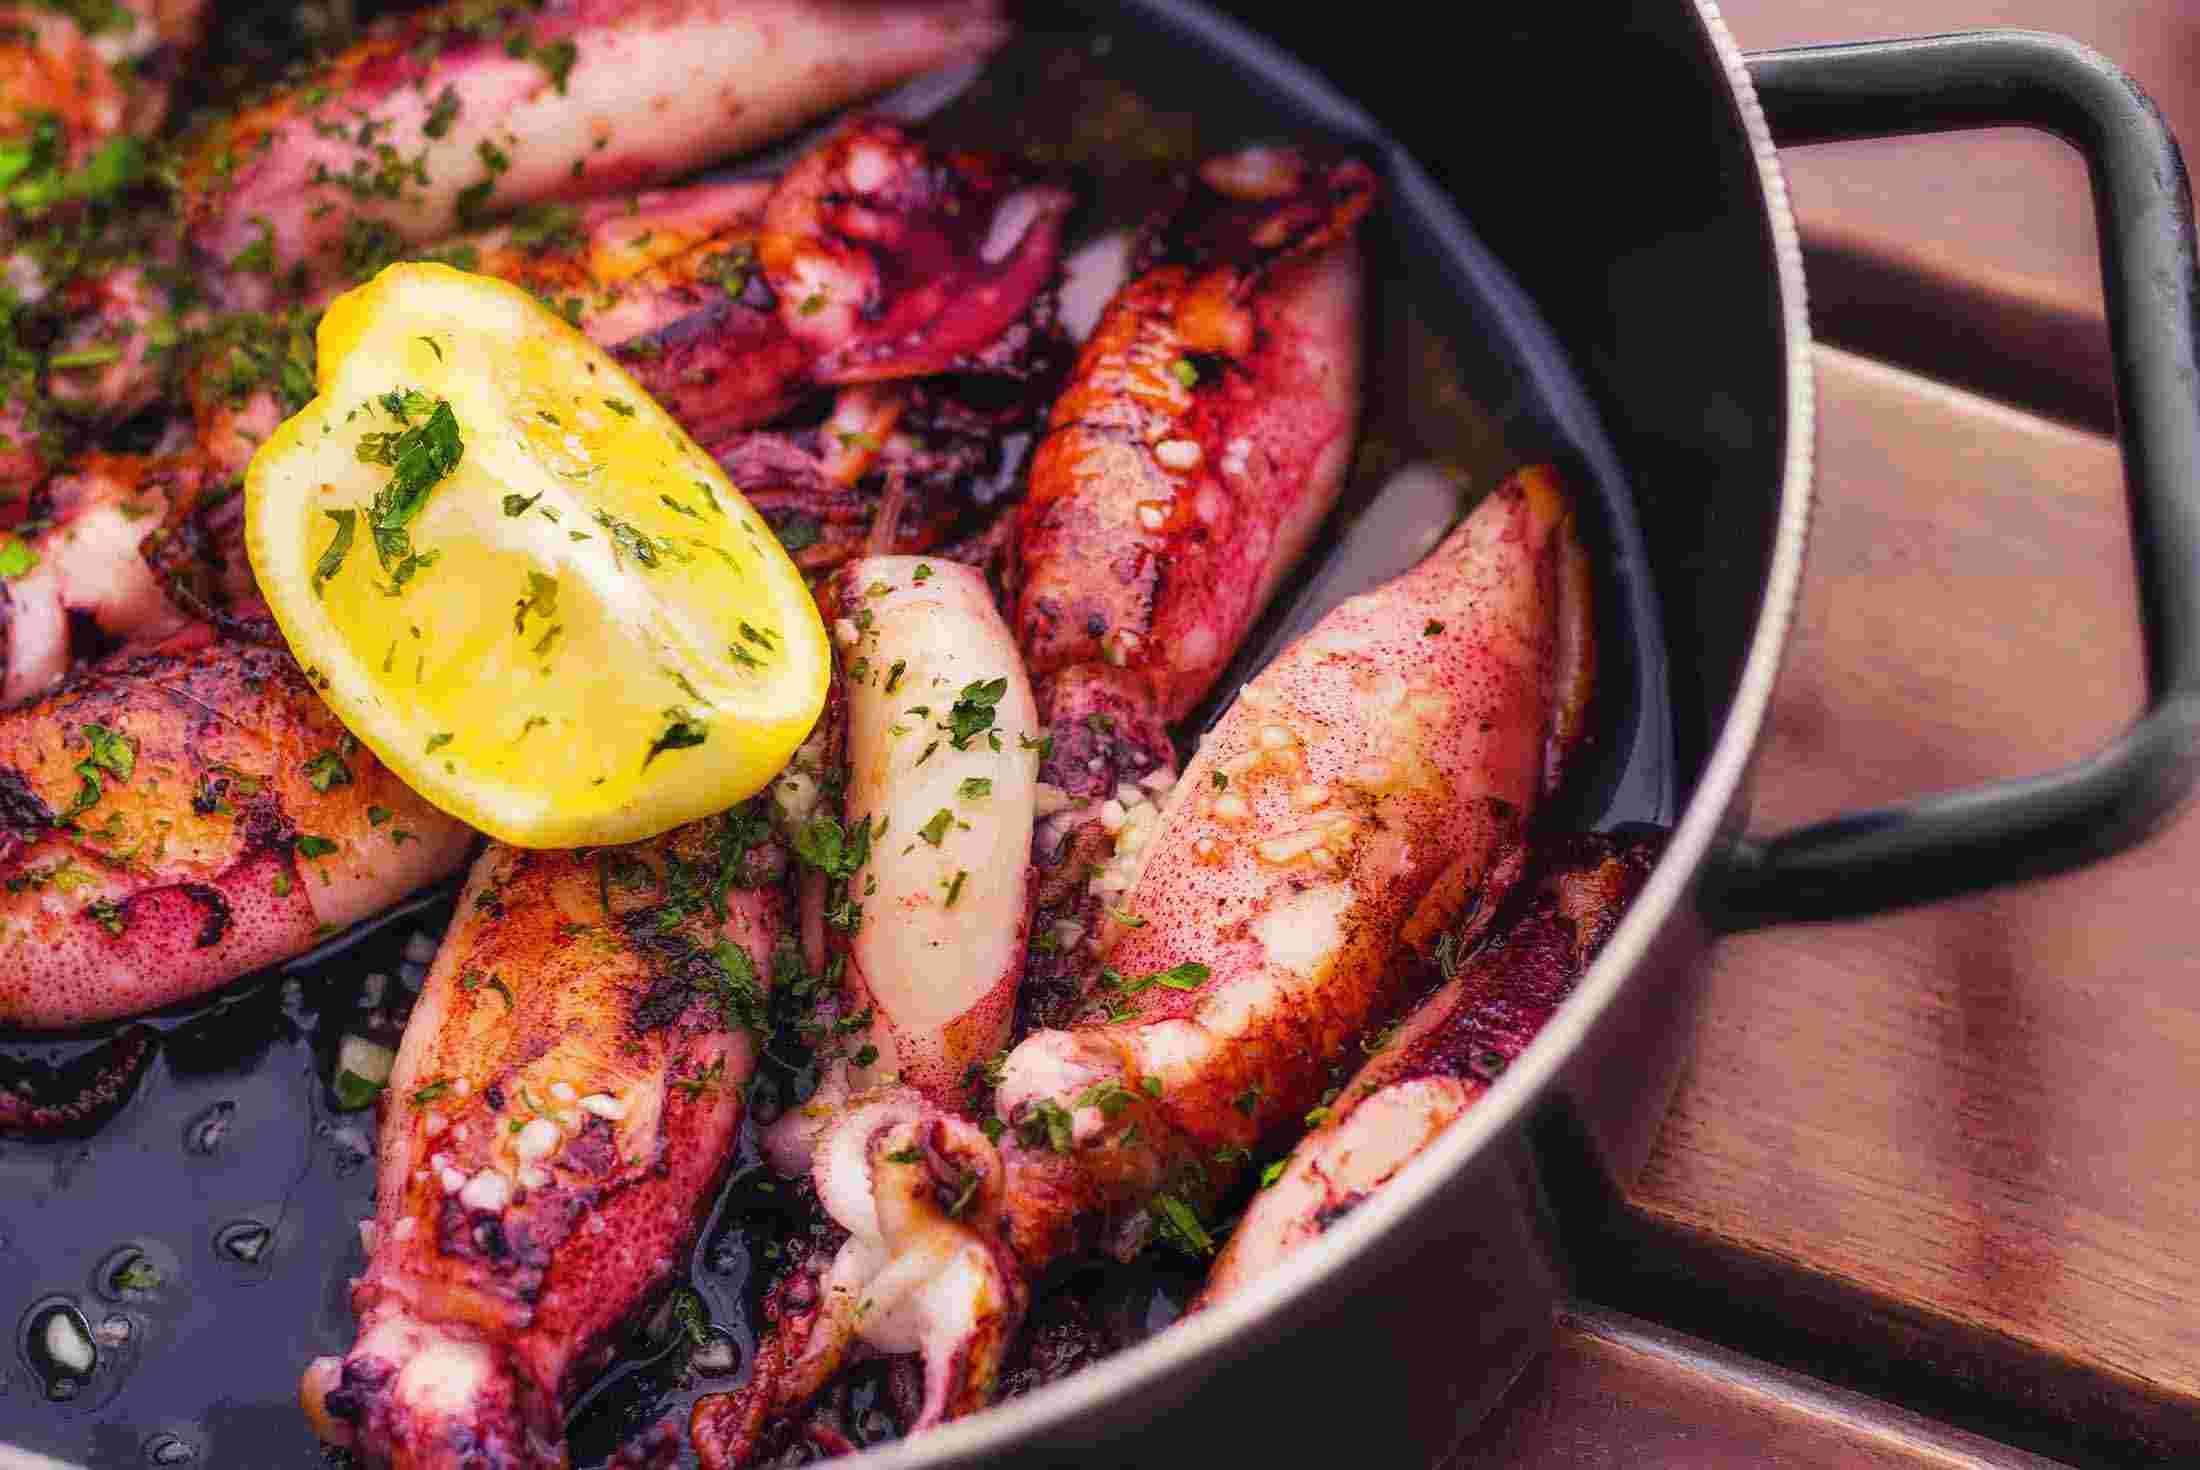 Adriatic squid prepared by locals in Croatia